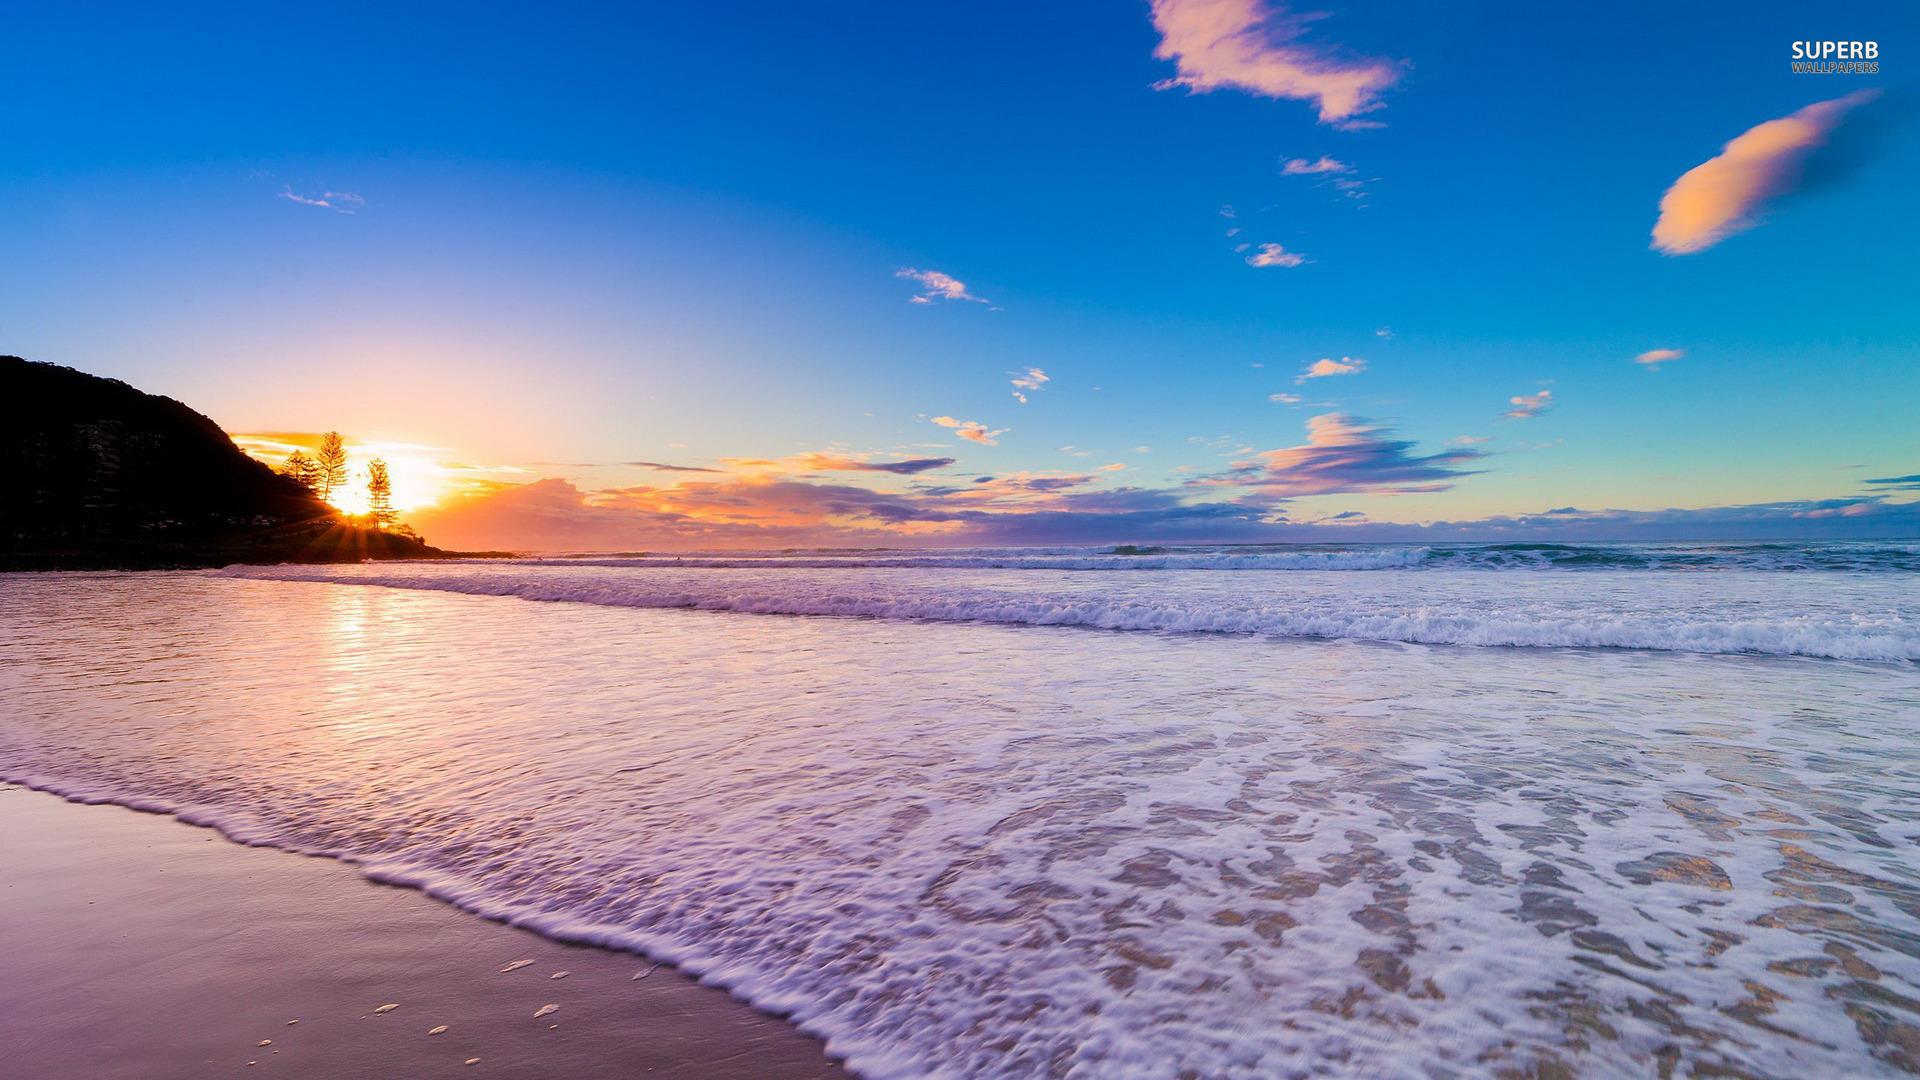 Sunset on the beach wallpaper 1920x1080